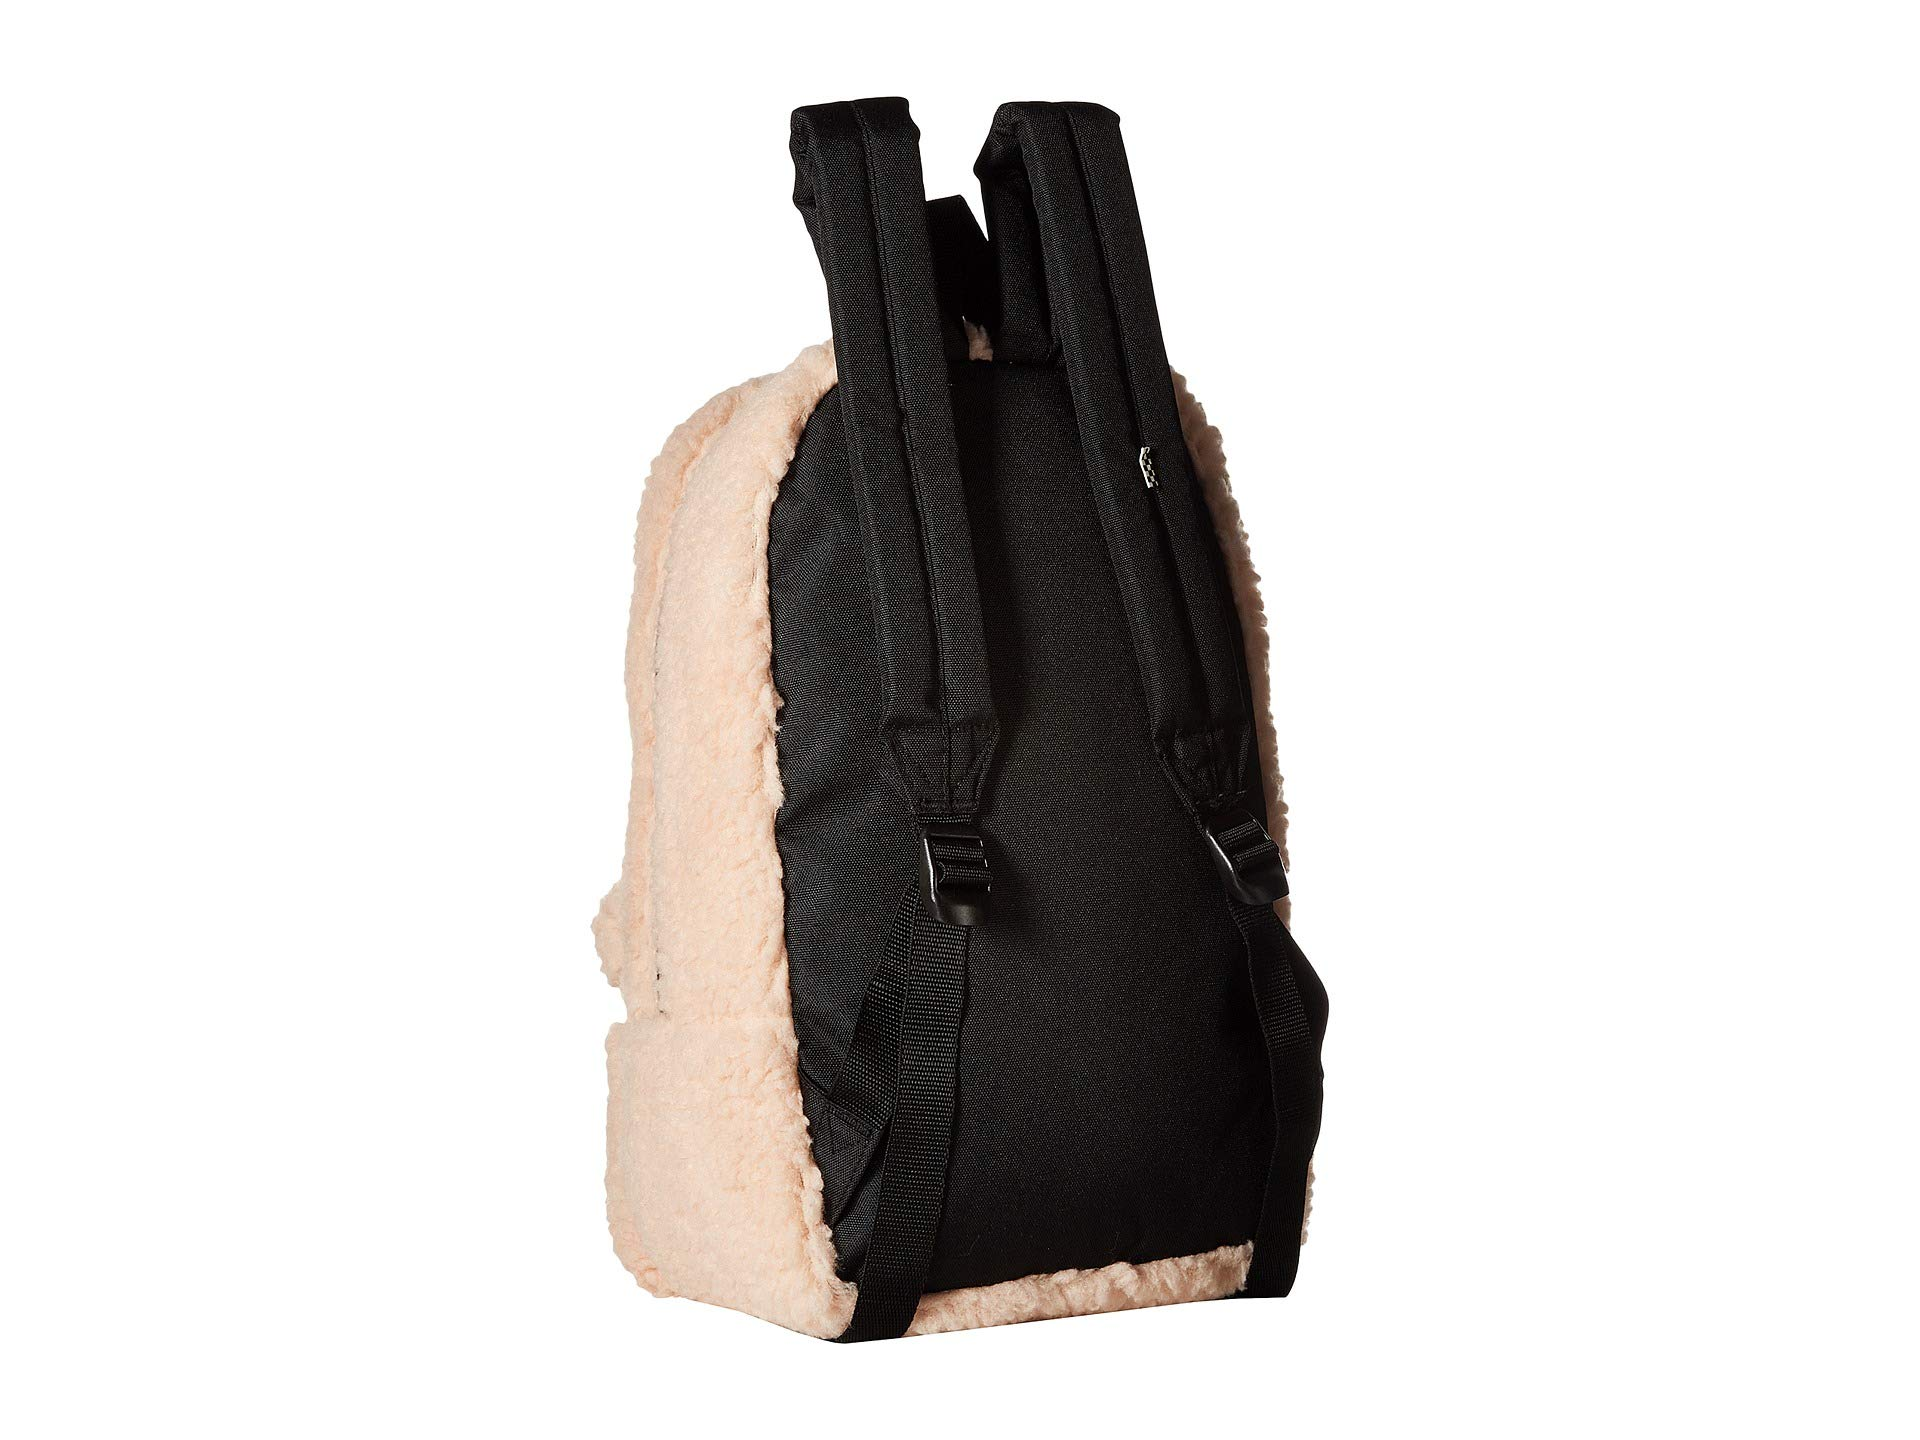 Cloud Backpack Sherpa Vans Rose Calico PwqXZnxf4H